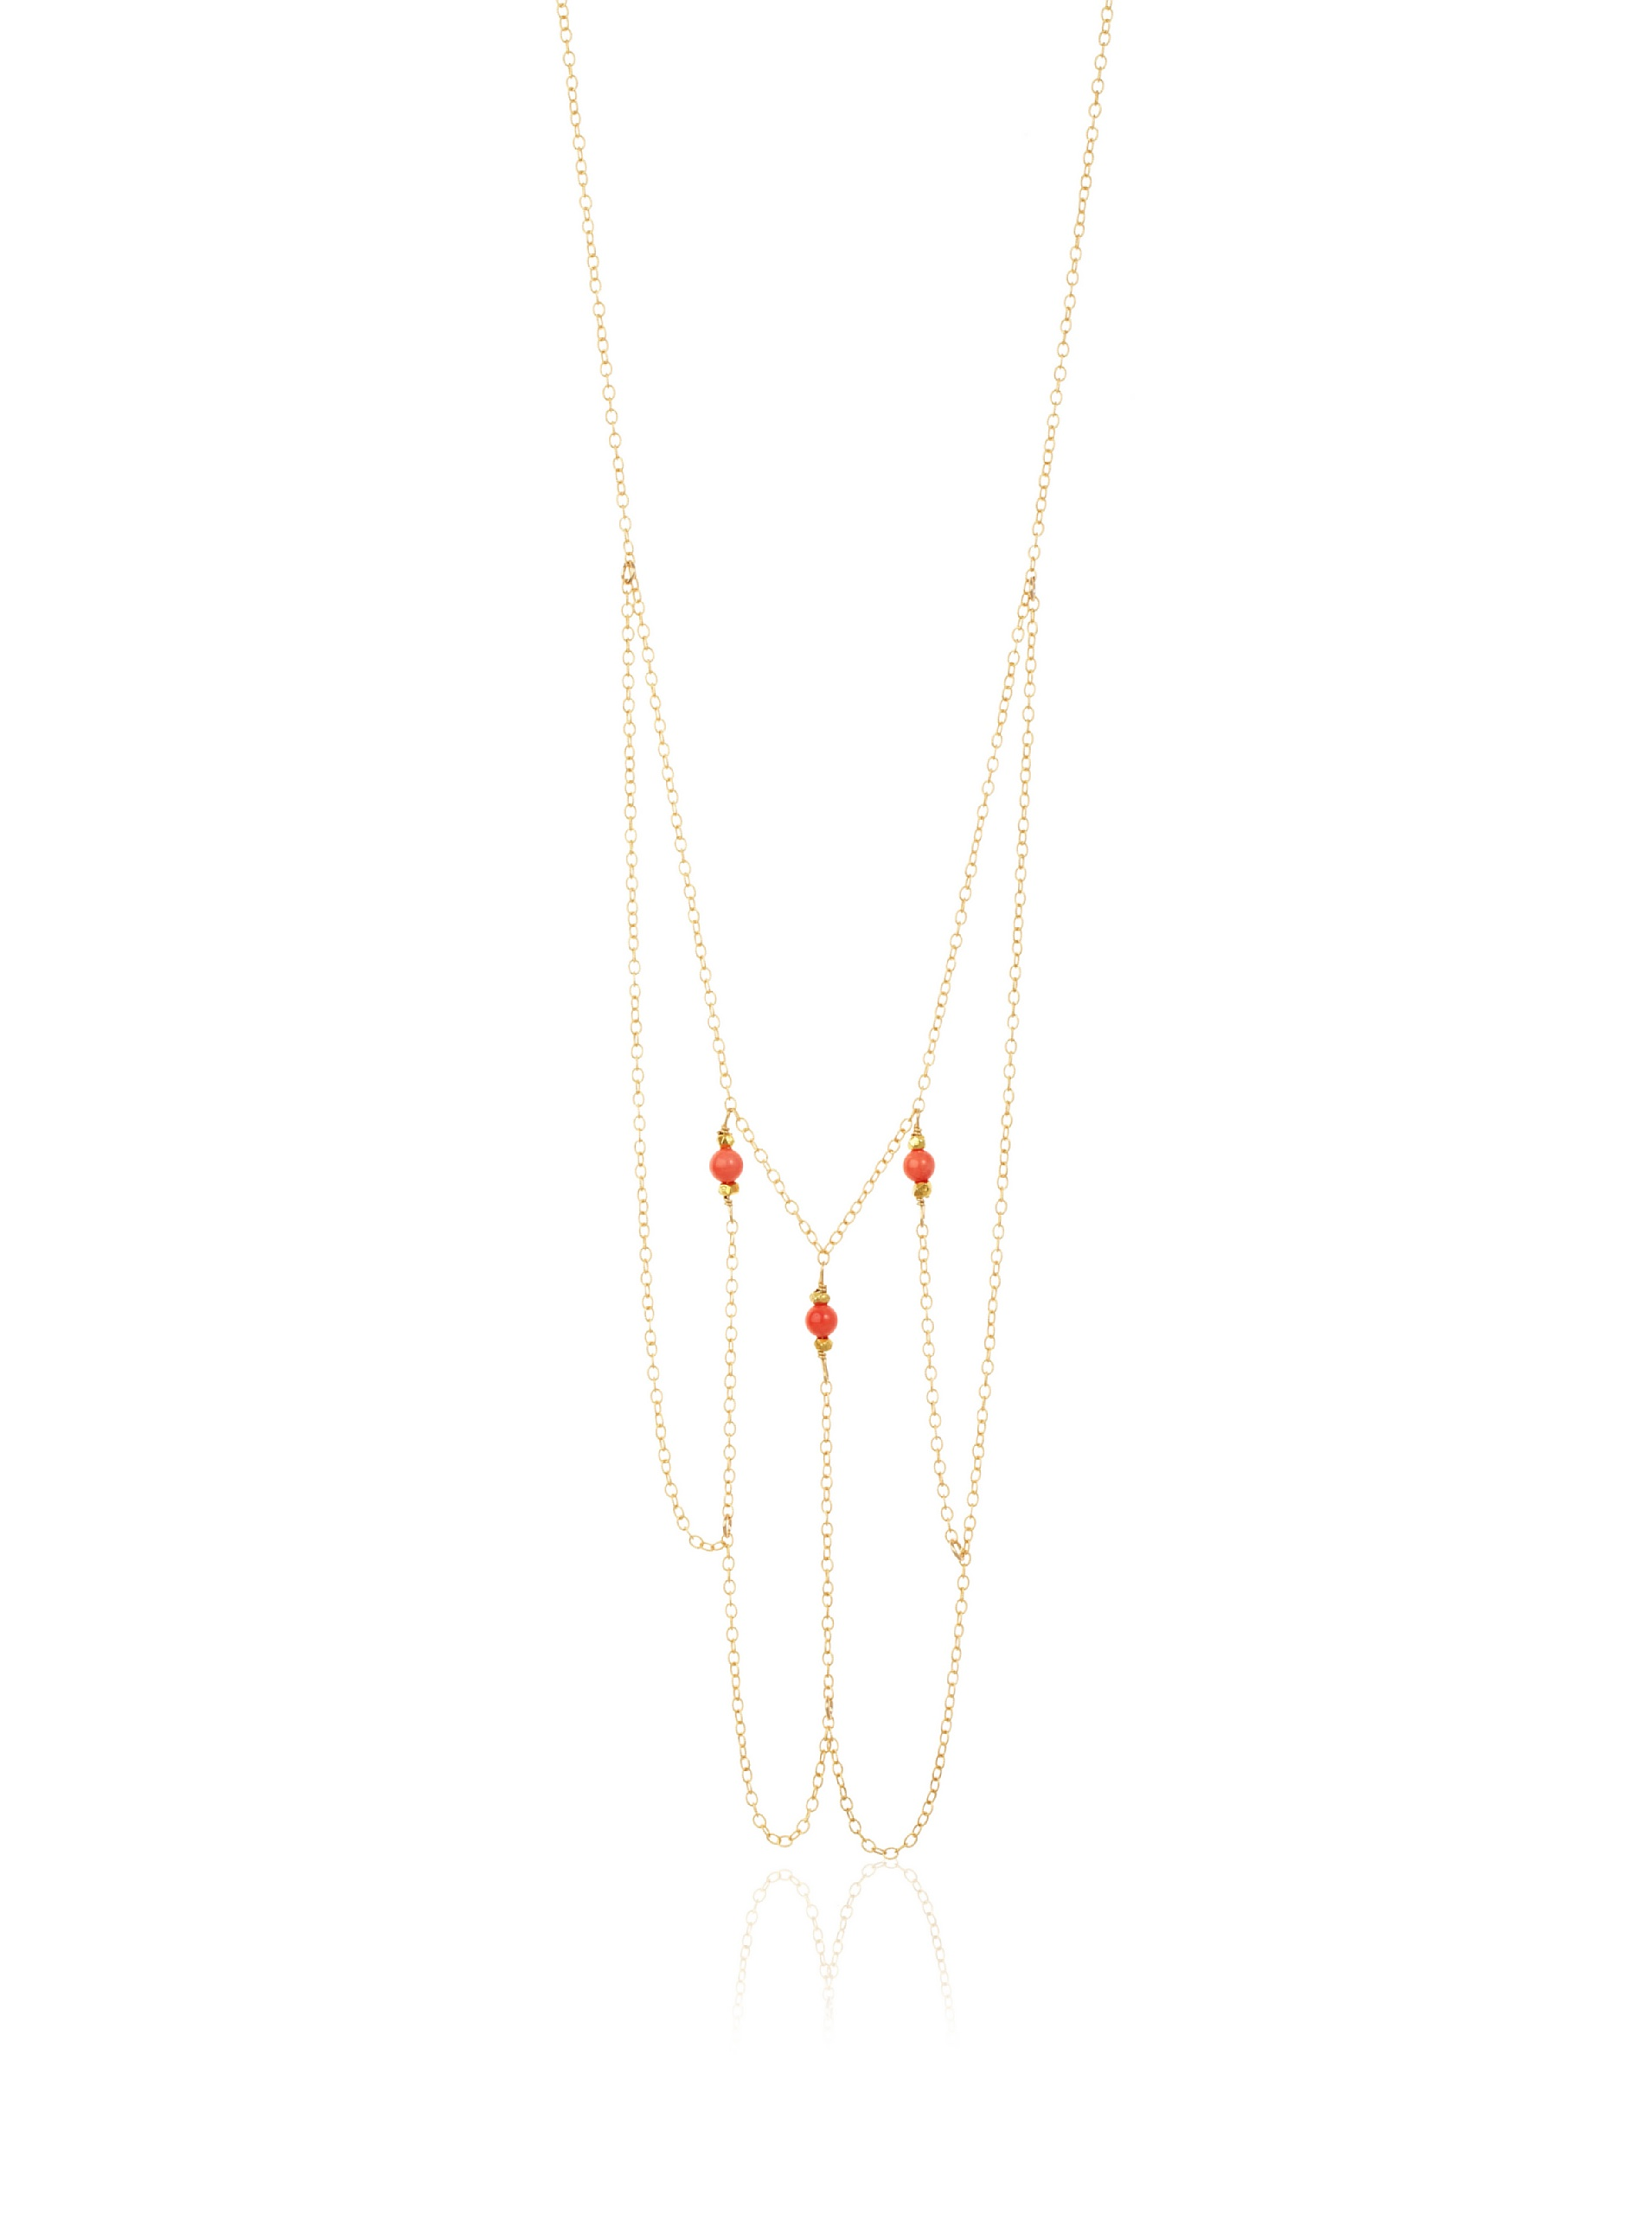 Gorjana Capri Long Layered Necklace, Coral